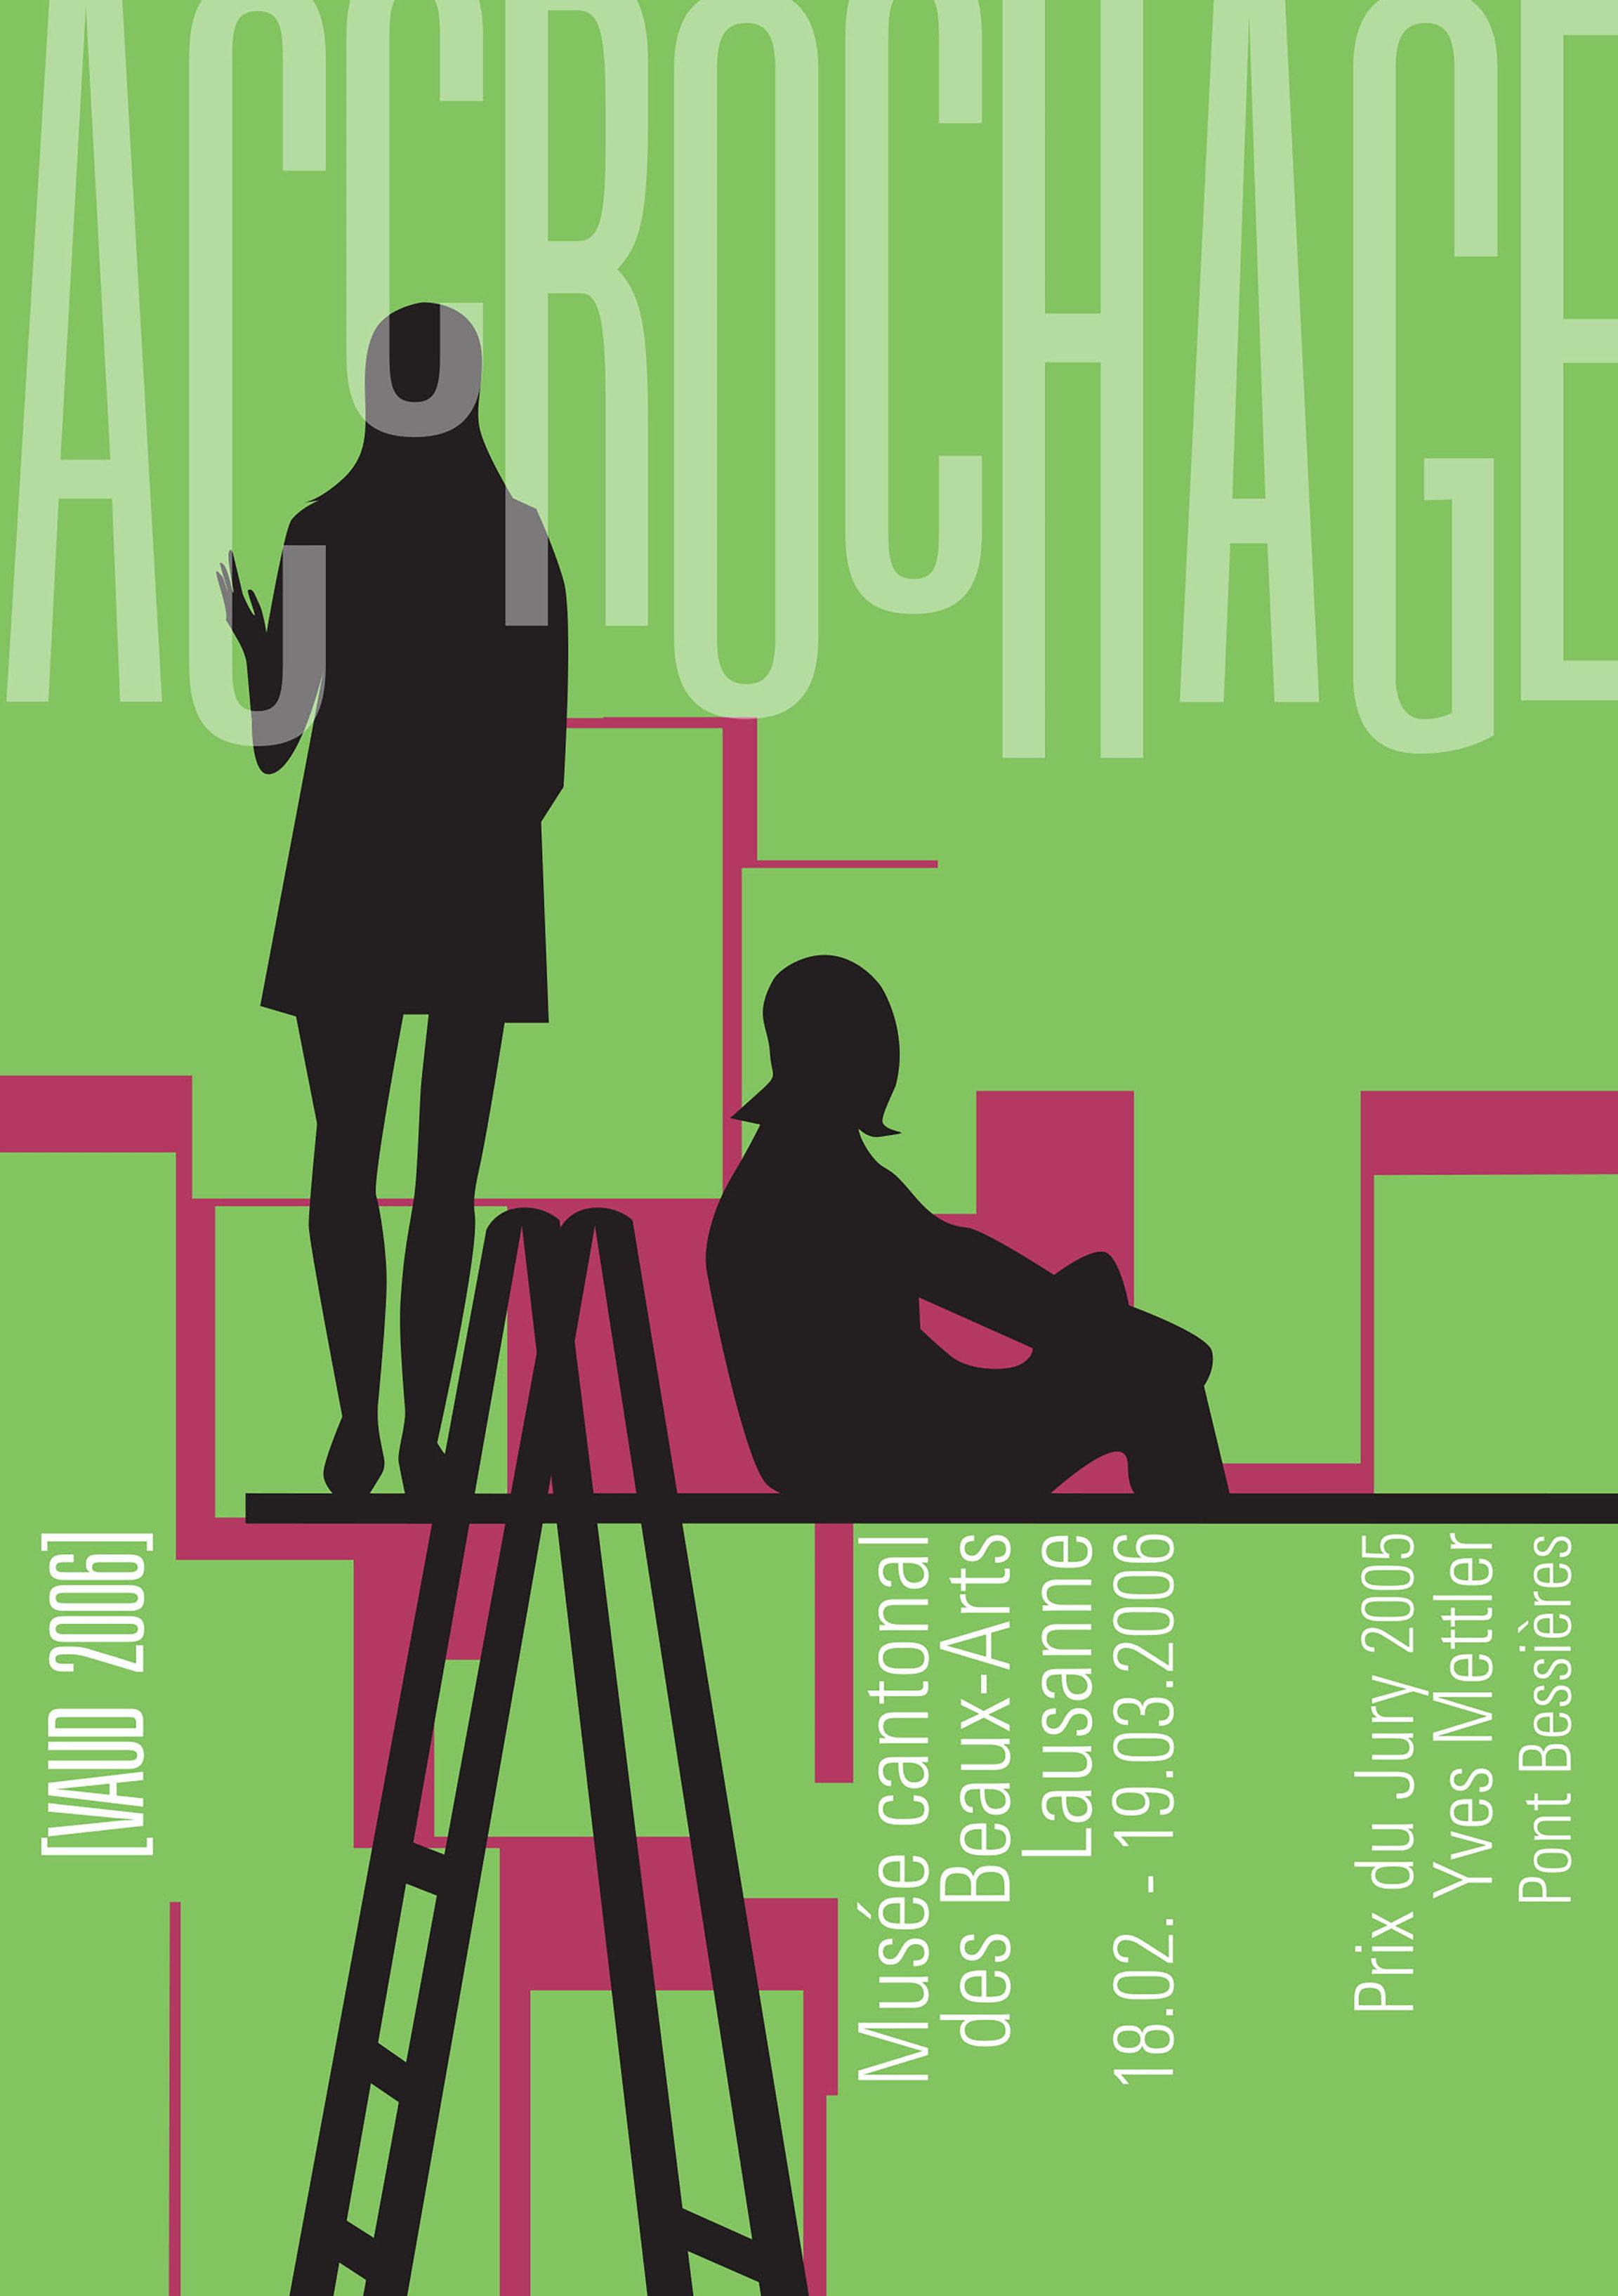 Accrochage [Vaud 2006] & <br>Yves Mettler, Prix du Jury 2005